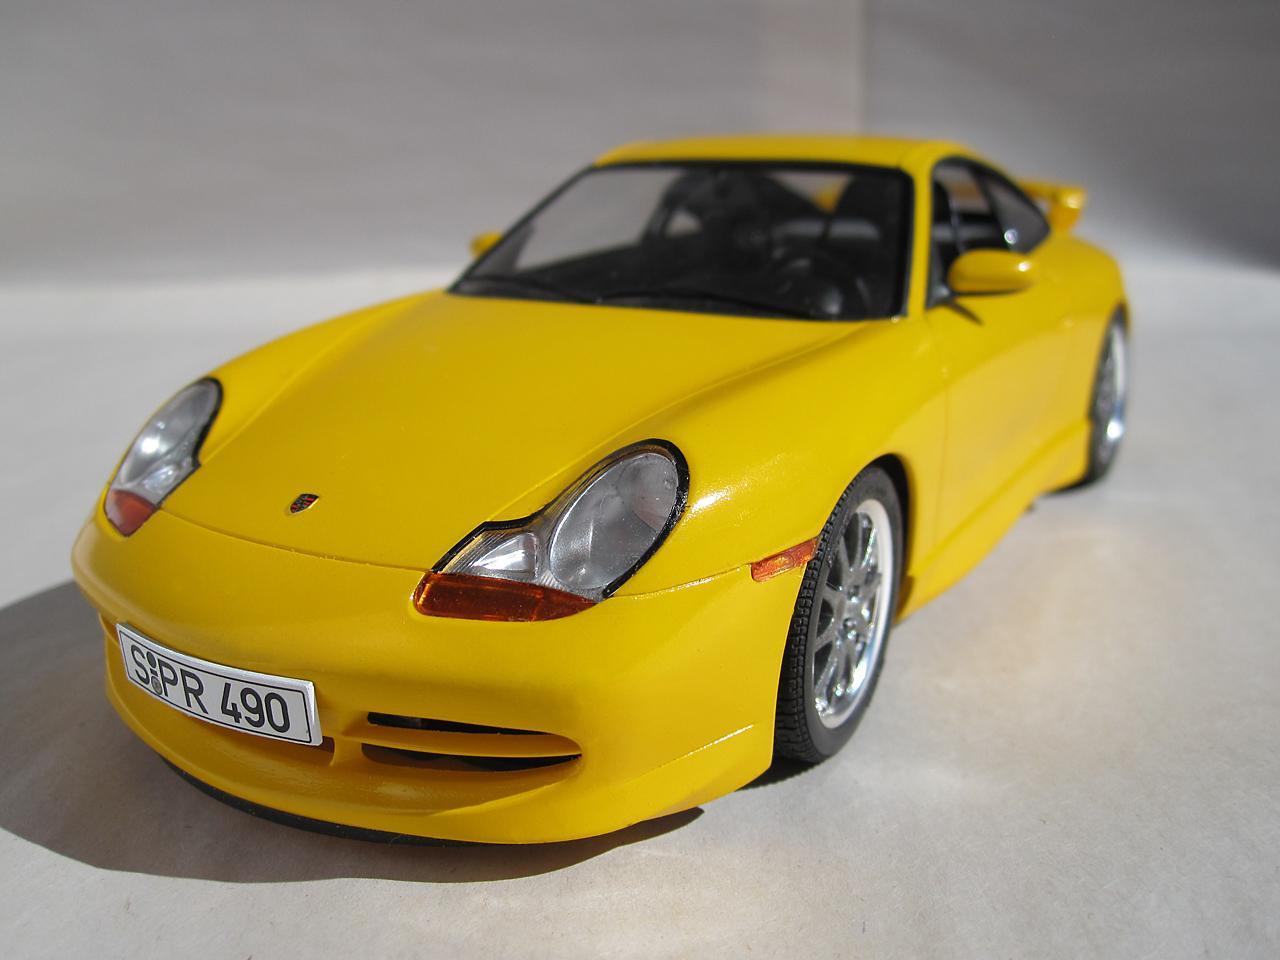 porsche 911 gt3 tamiya 1 24 under glass model cars magazine forum. Black Bedroom Furniture Sets. Home Design Ideas